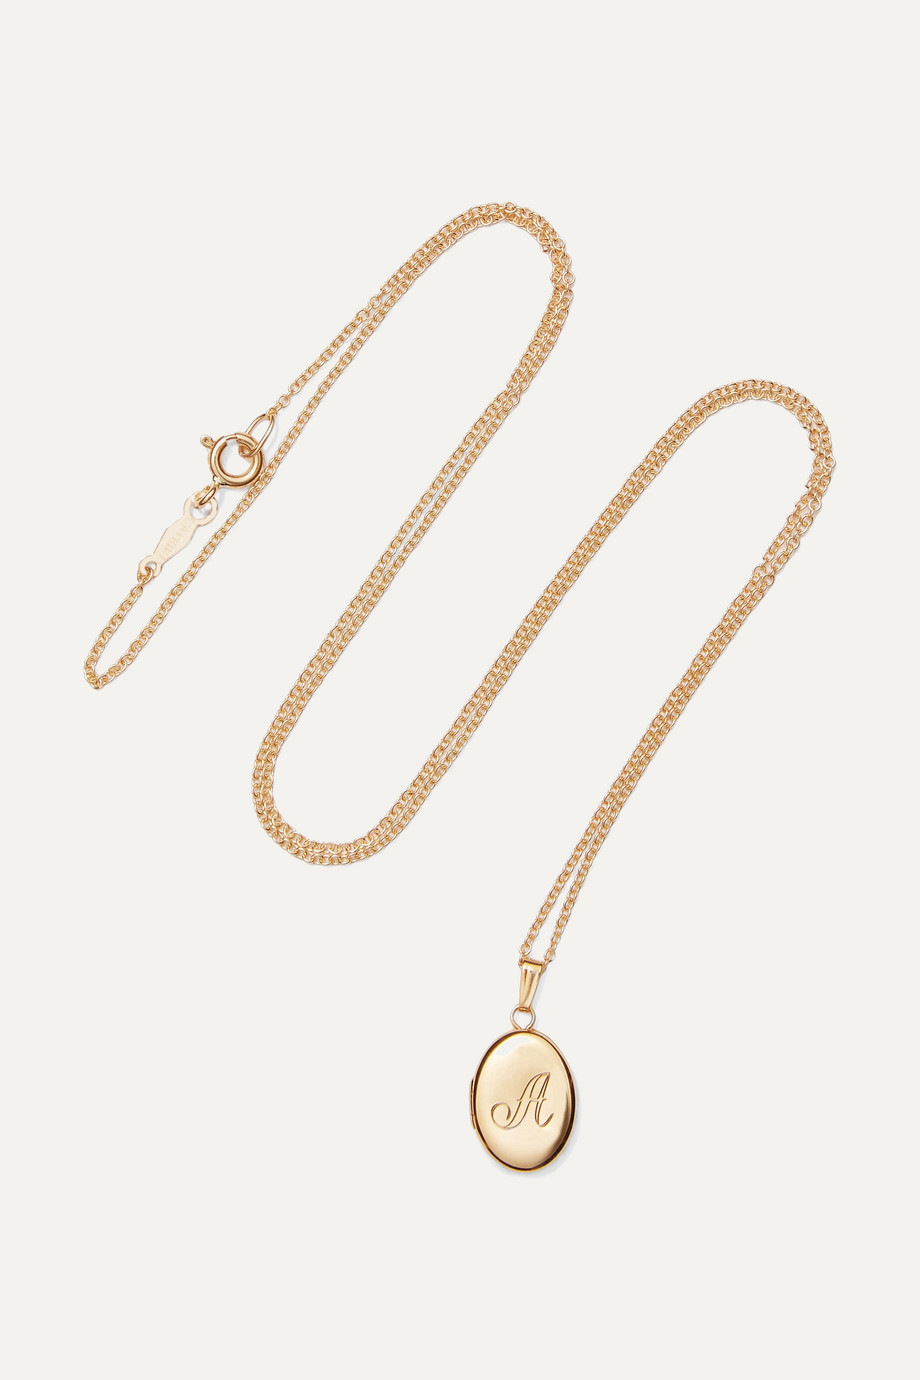 Catbird + NET SUSTAIN Dollhouse 14-karat gold necklace